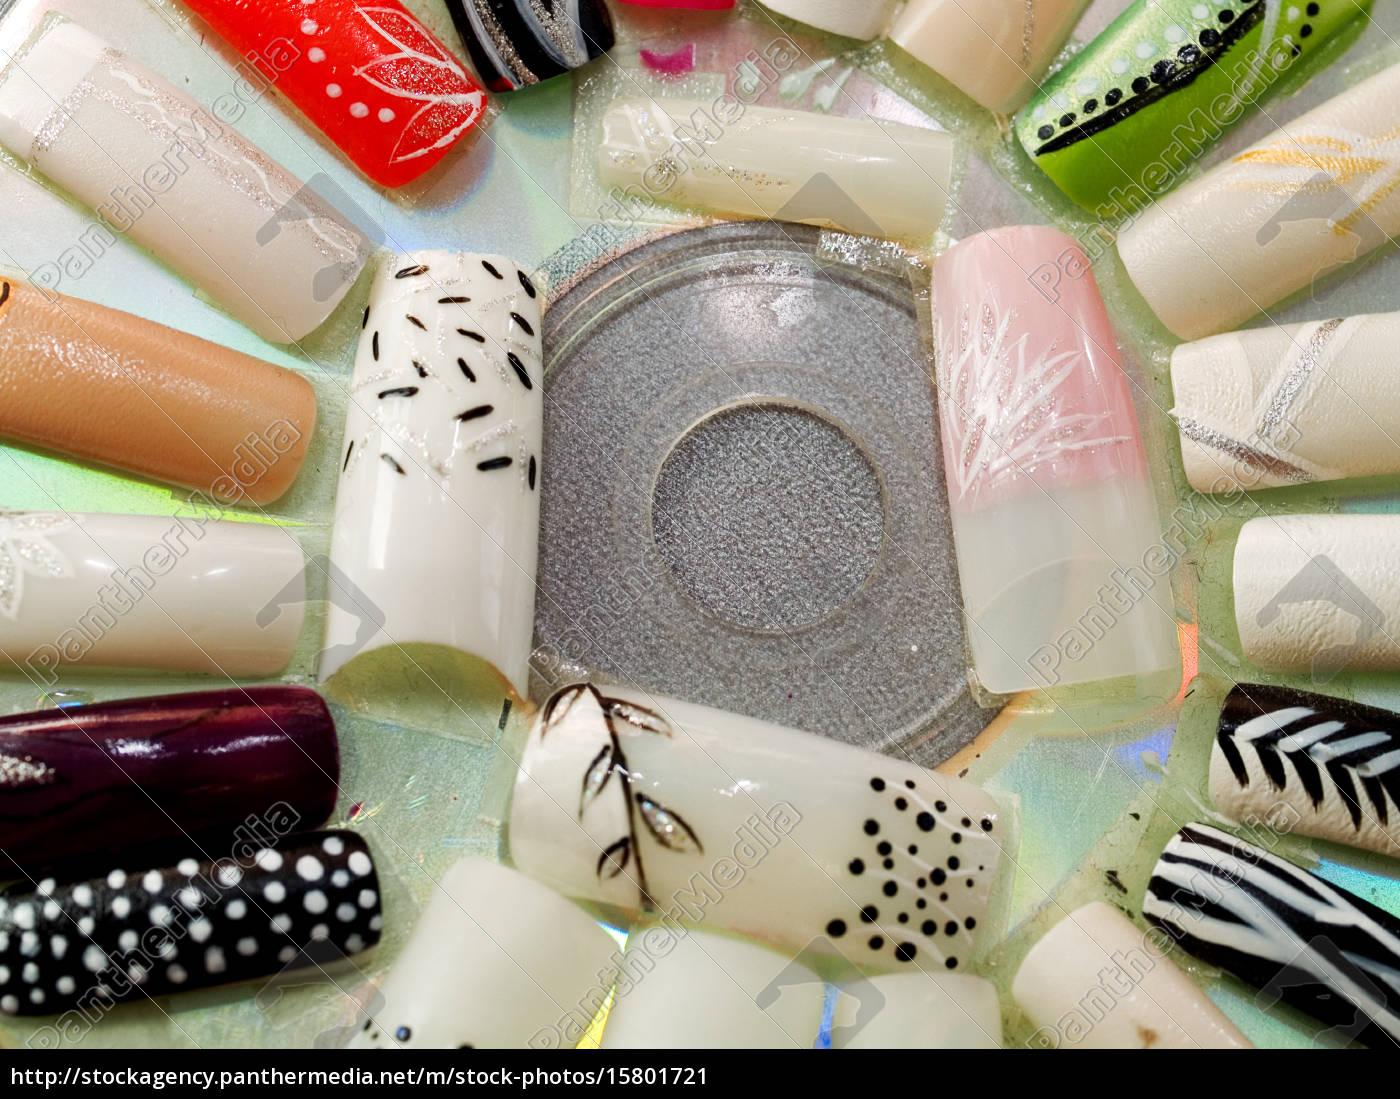 manicure, manicure, manicure, manicure - 15801721